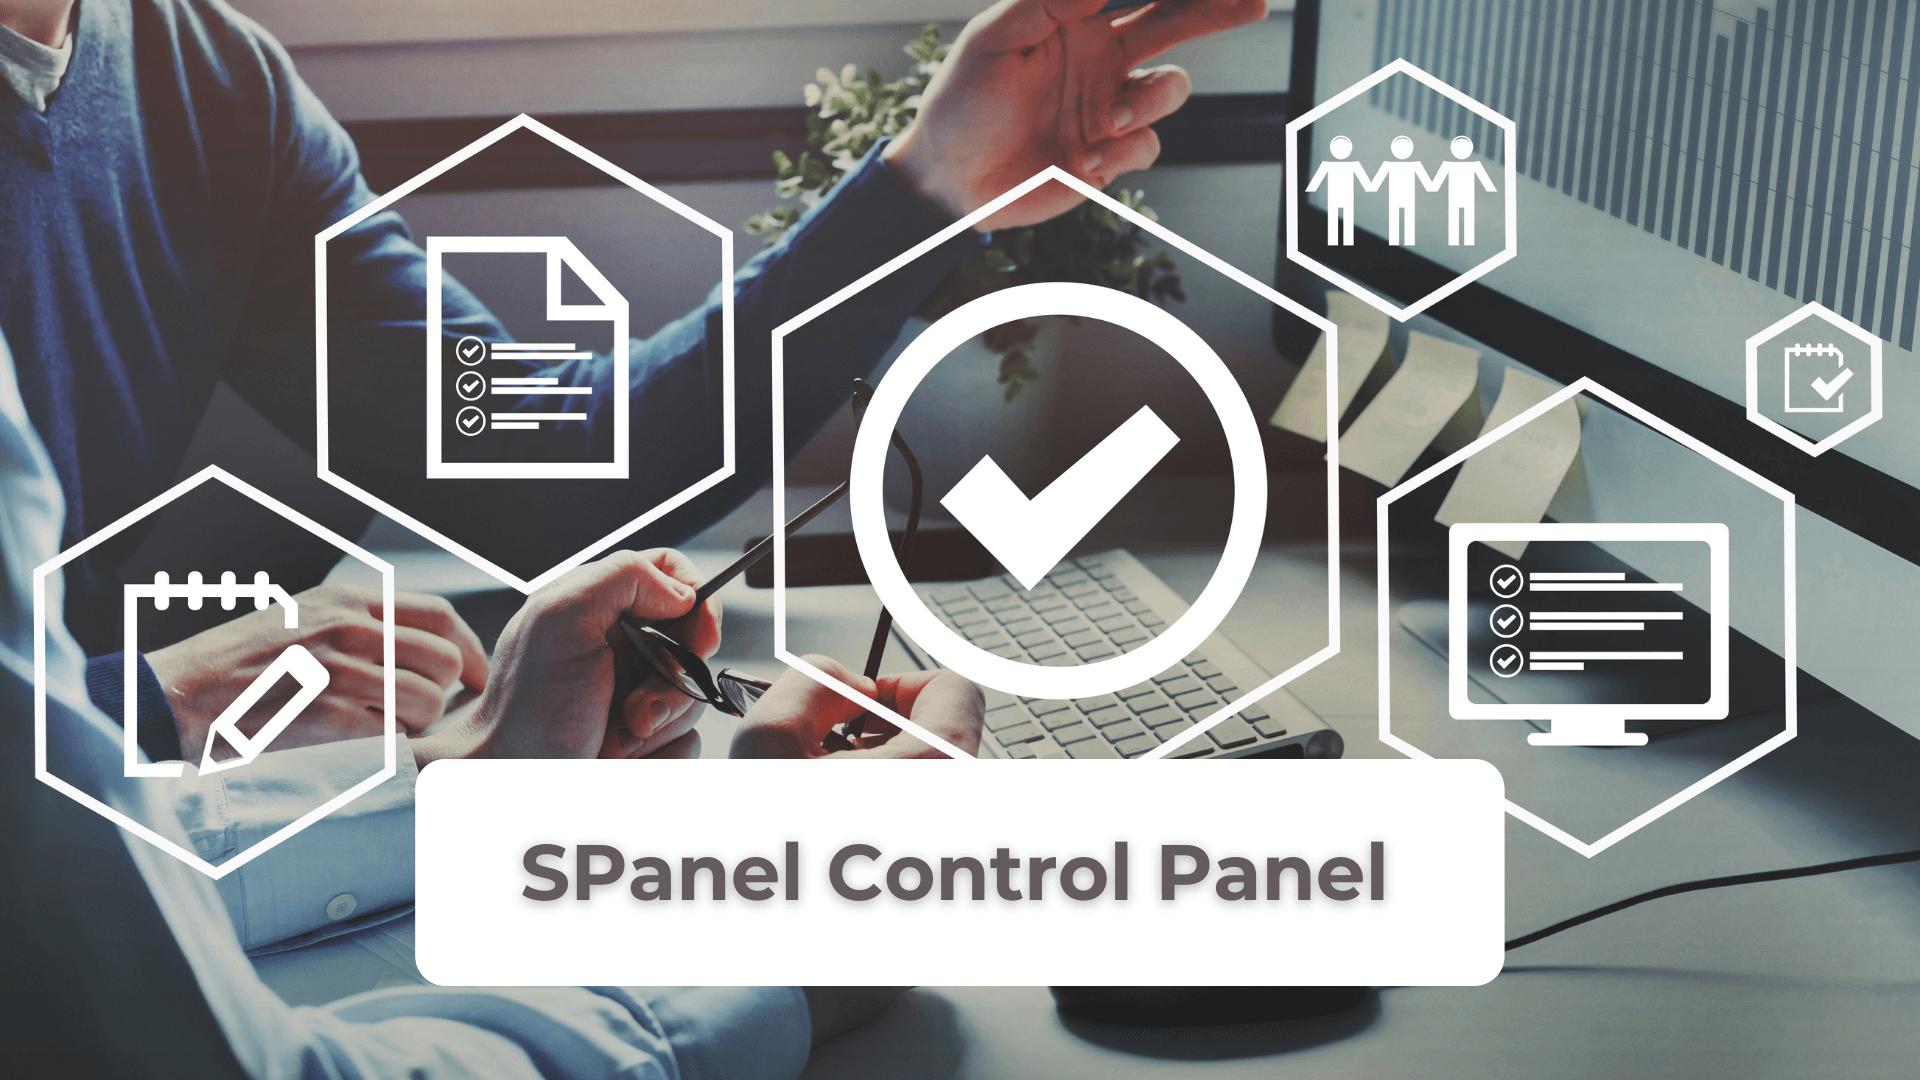 SPanel Control Panel